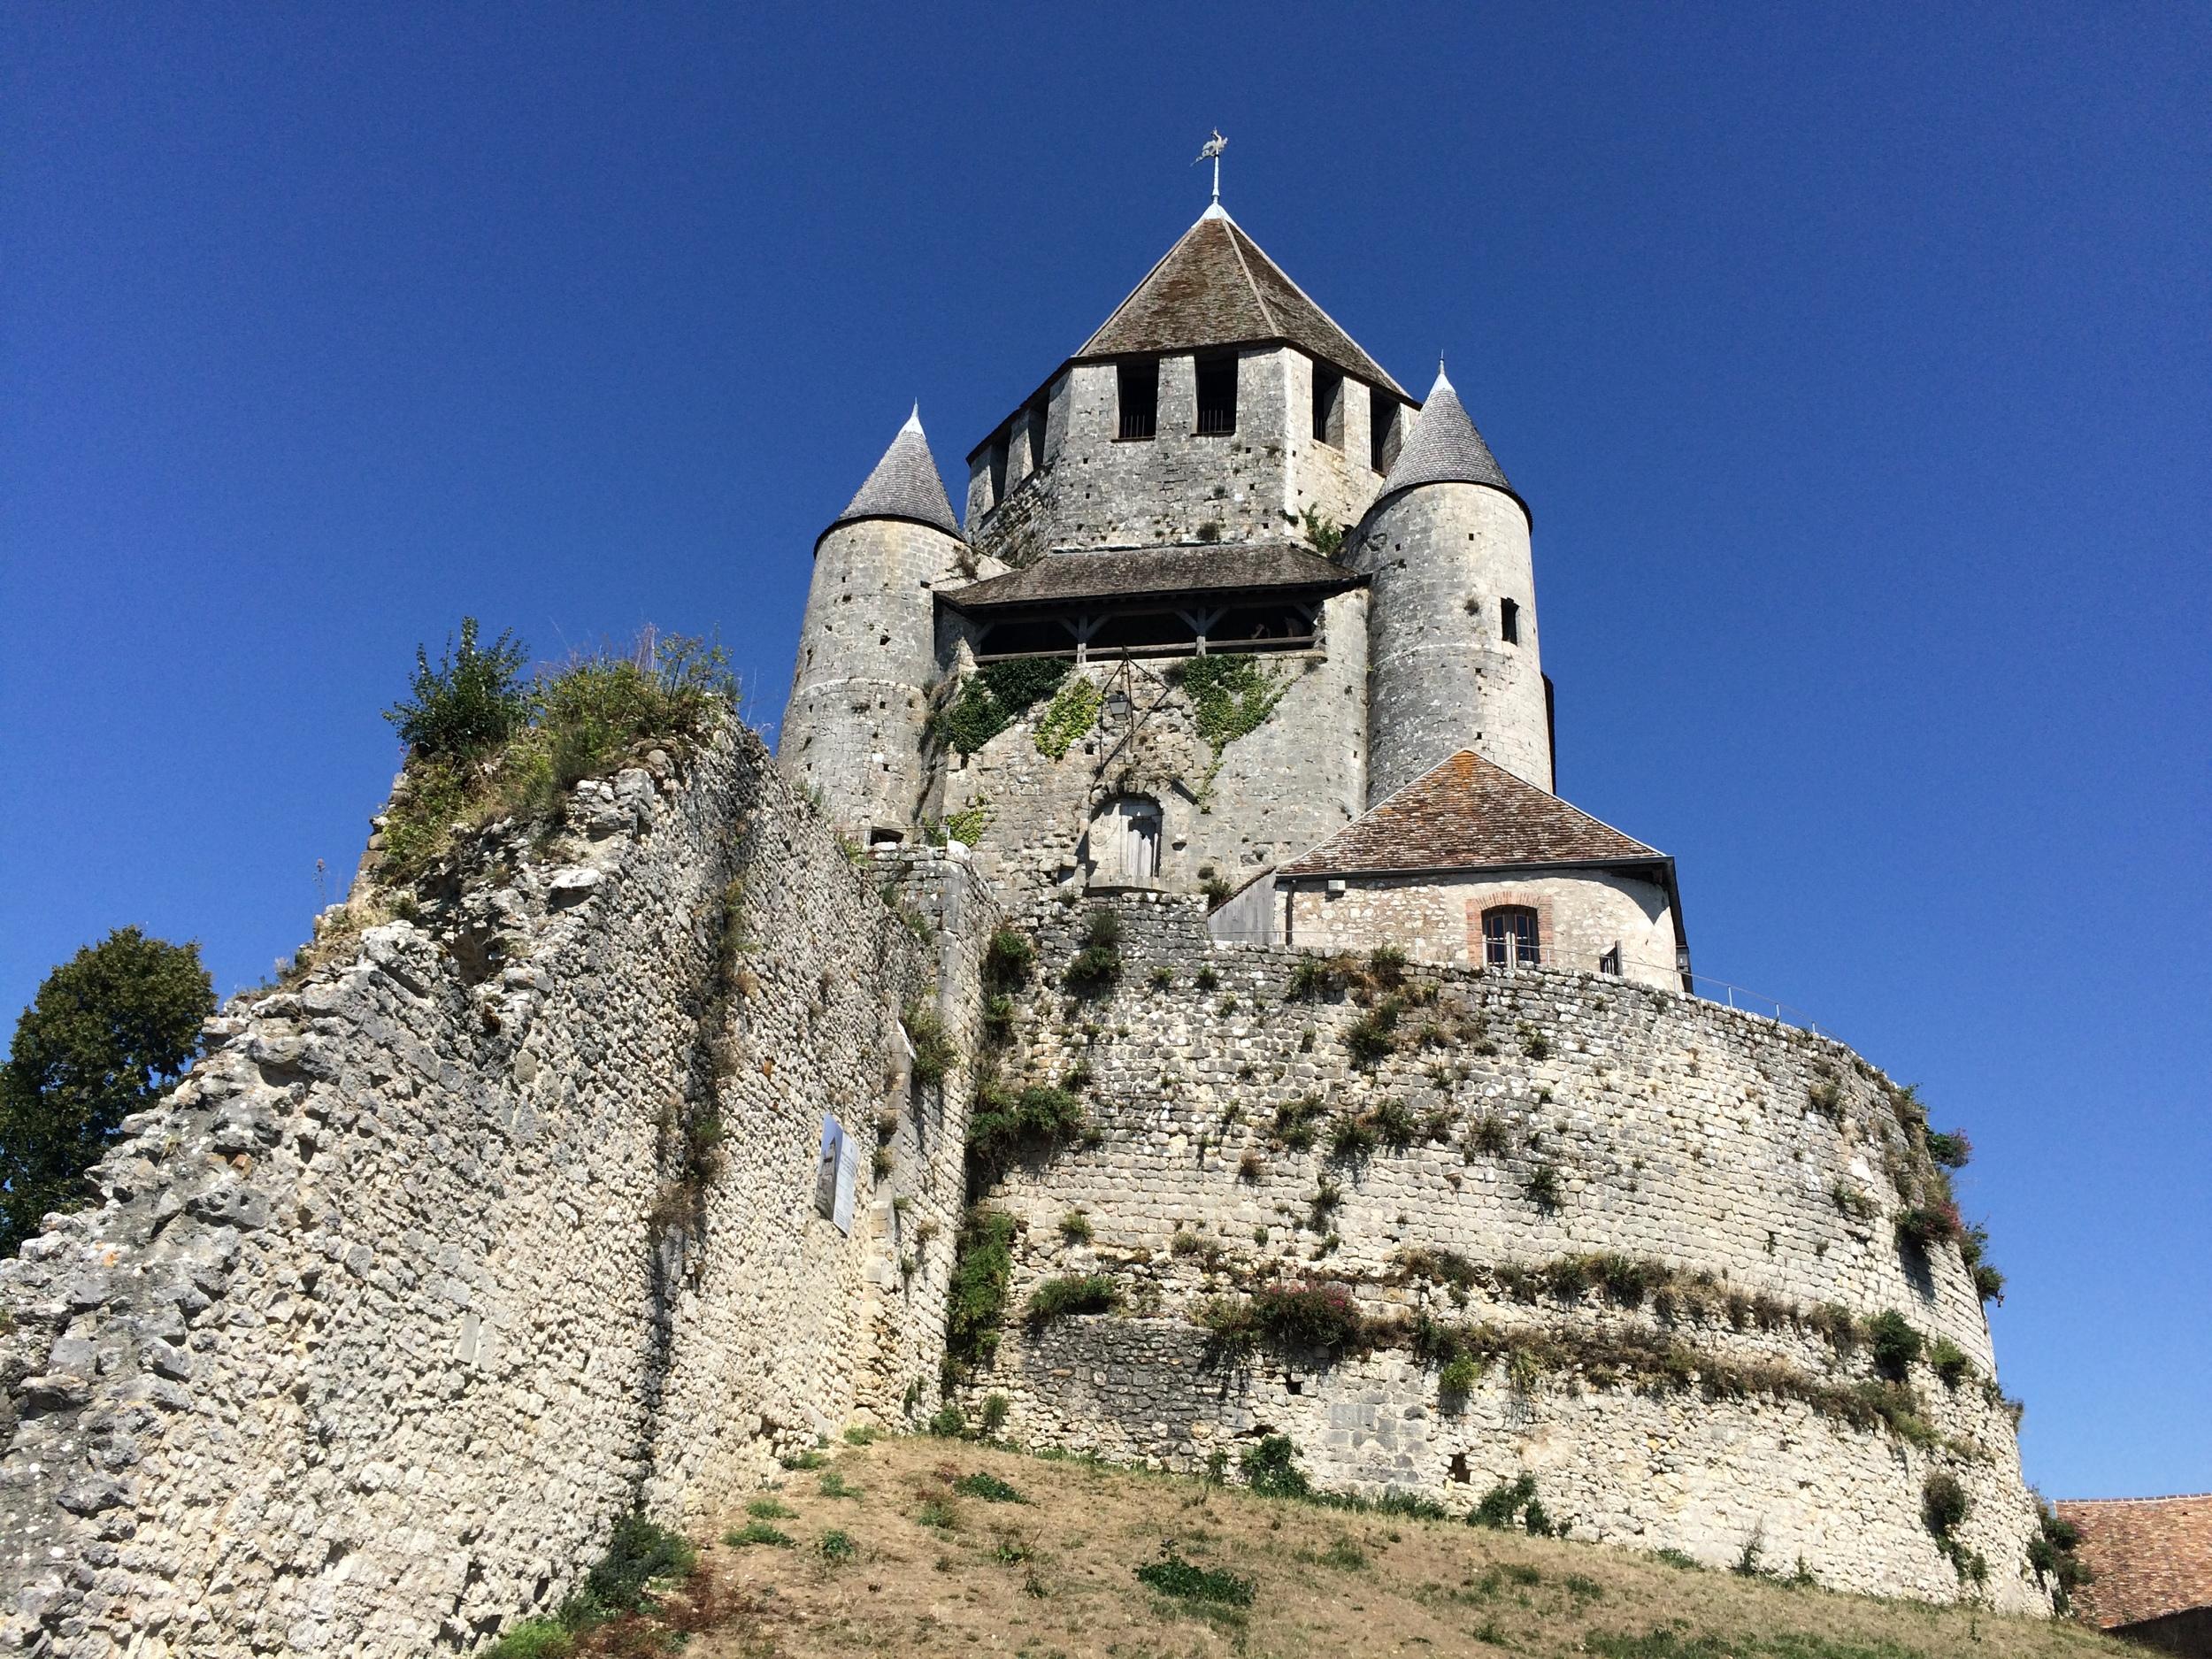 Tour César in Provins